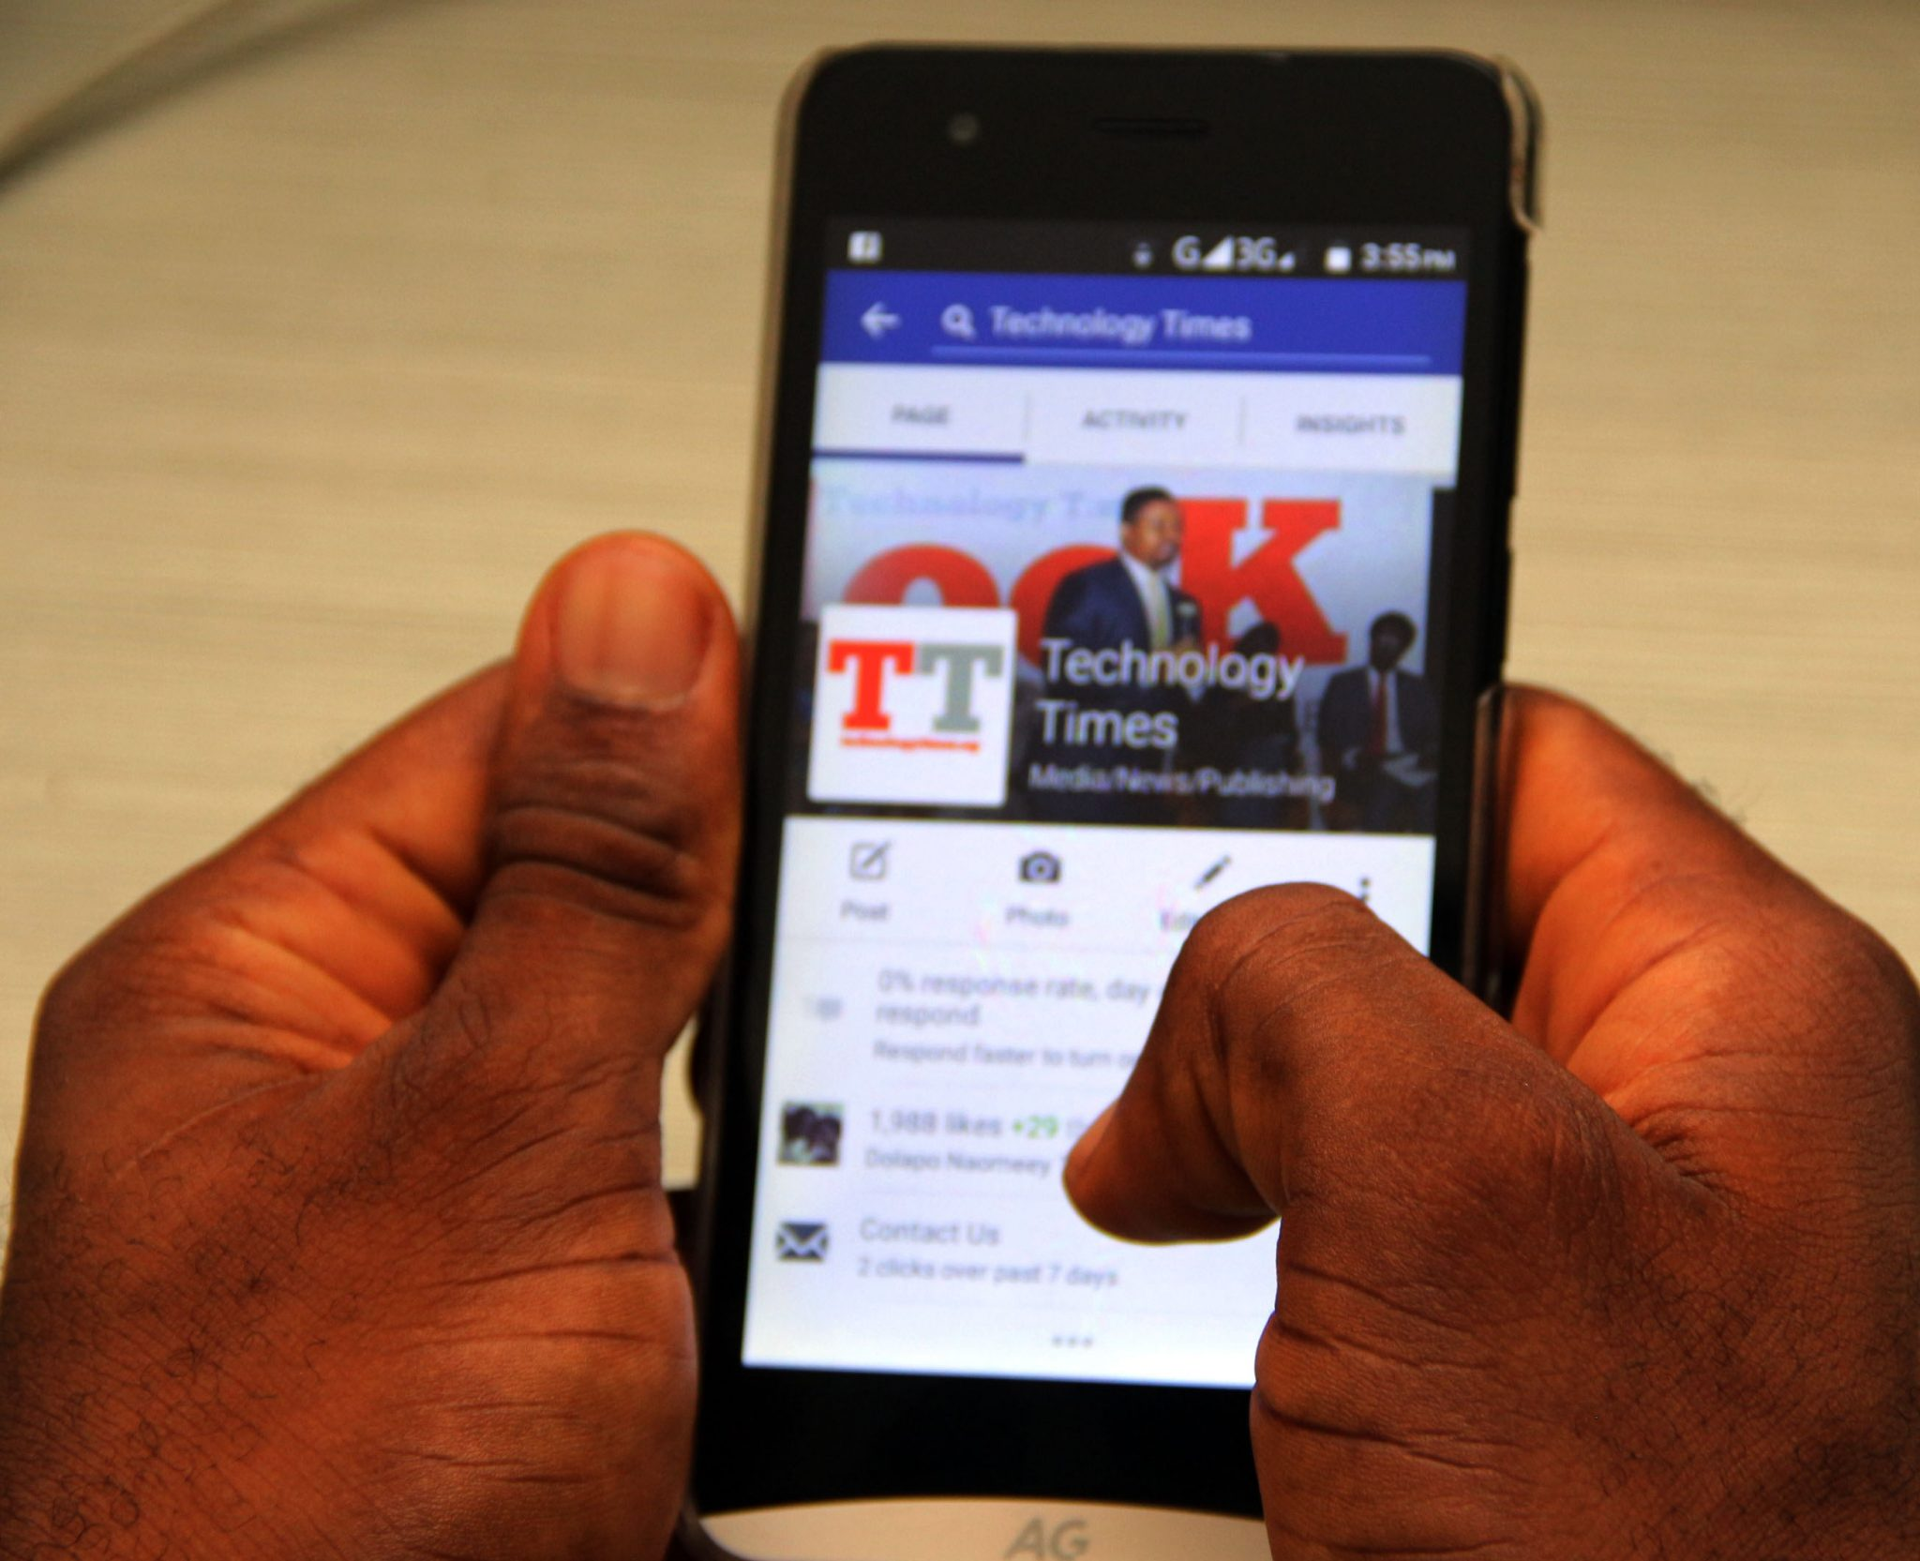 Facebook, Bots returns to Facebook Messenger, Technology Times